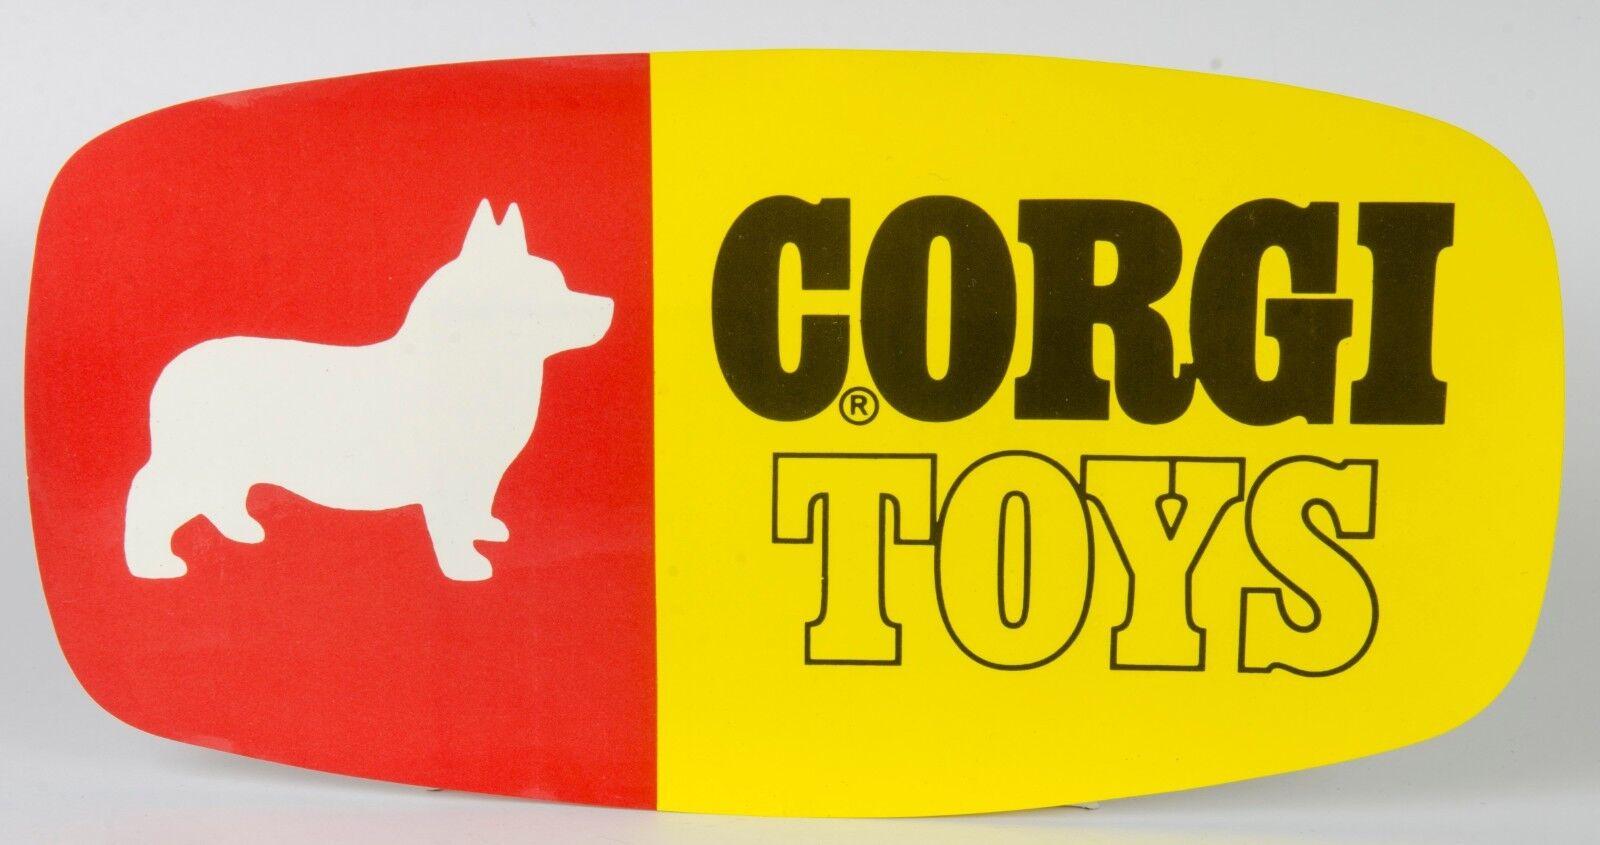 Corgi Toys Tienda PanDimensione Firme. Original Década de 1960 USA sin usar stock de tienda. Menta Raro